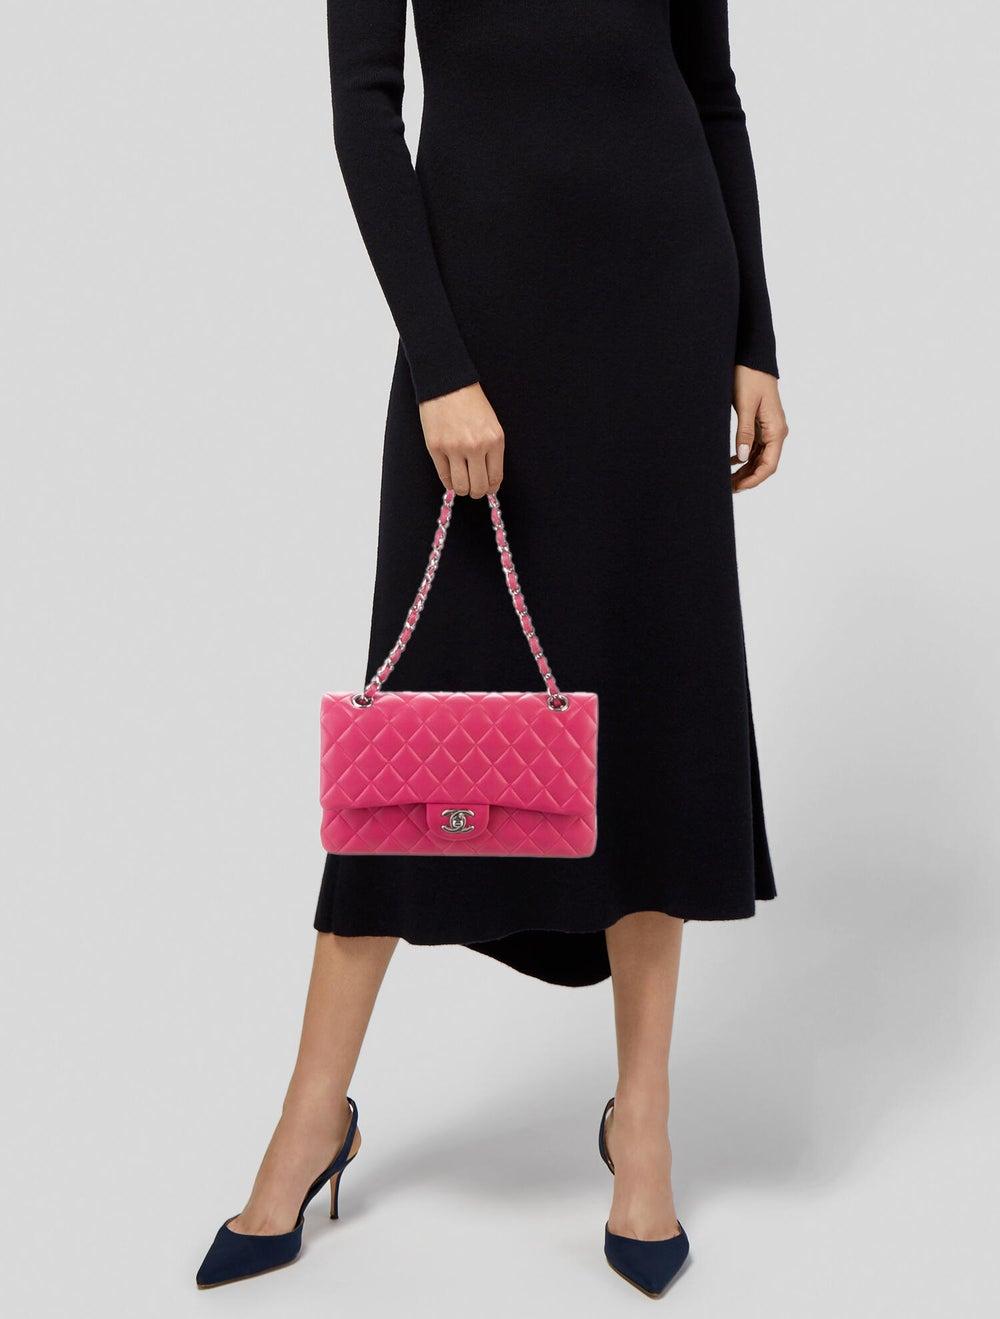 Chanel Classic Medium Double Flap Bag Pink - image 2